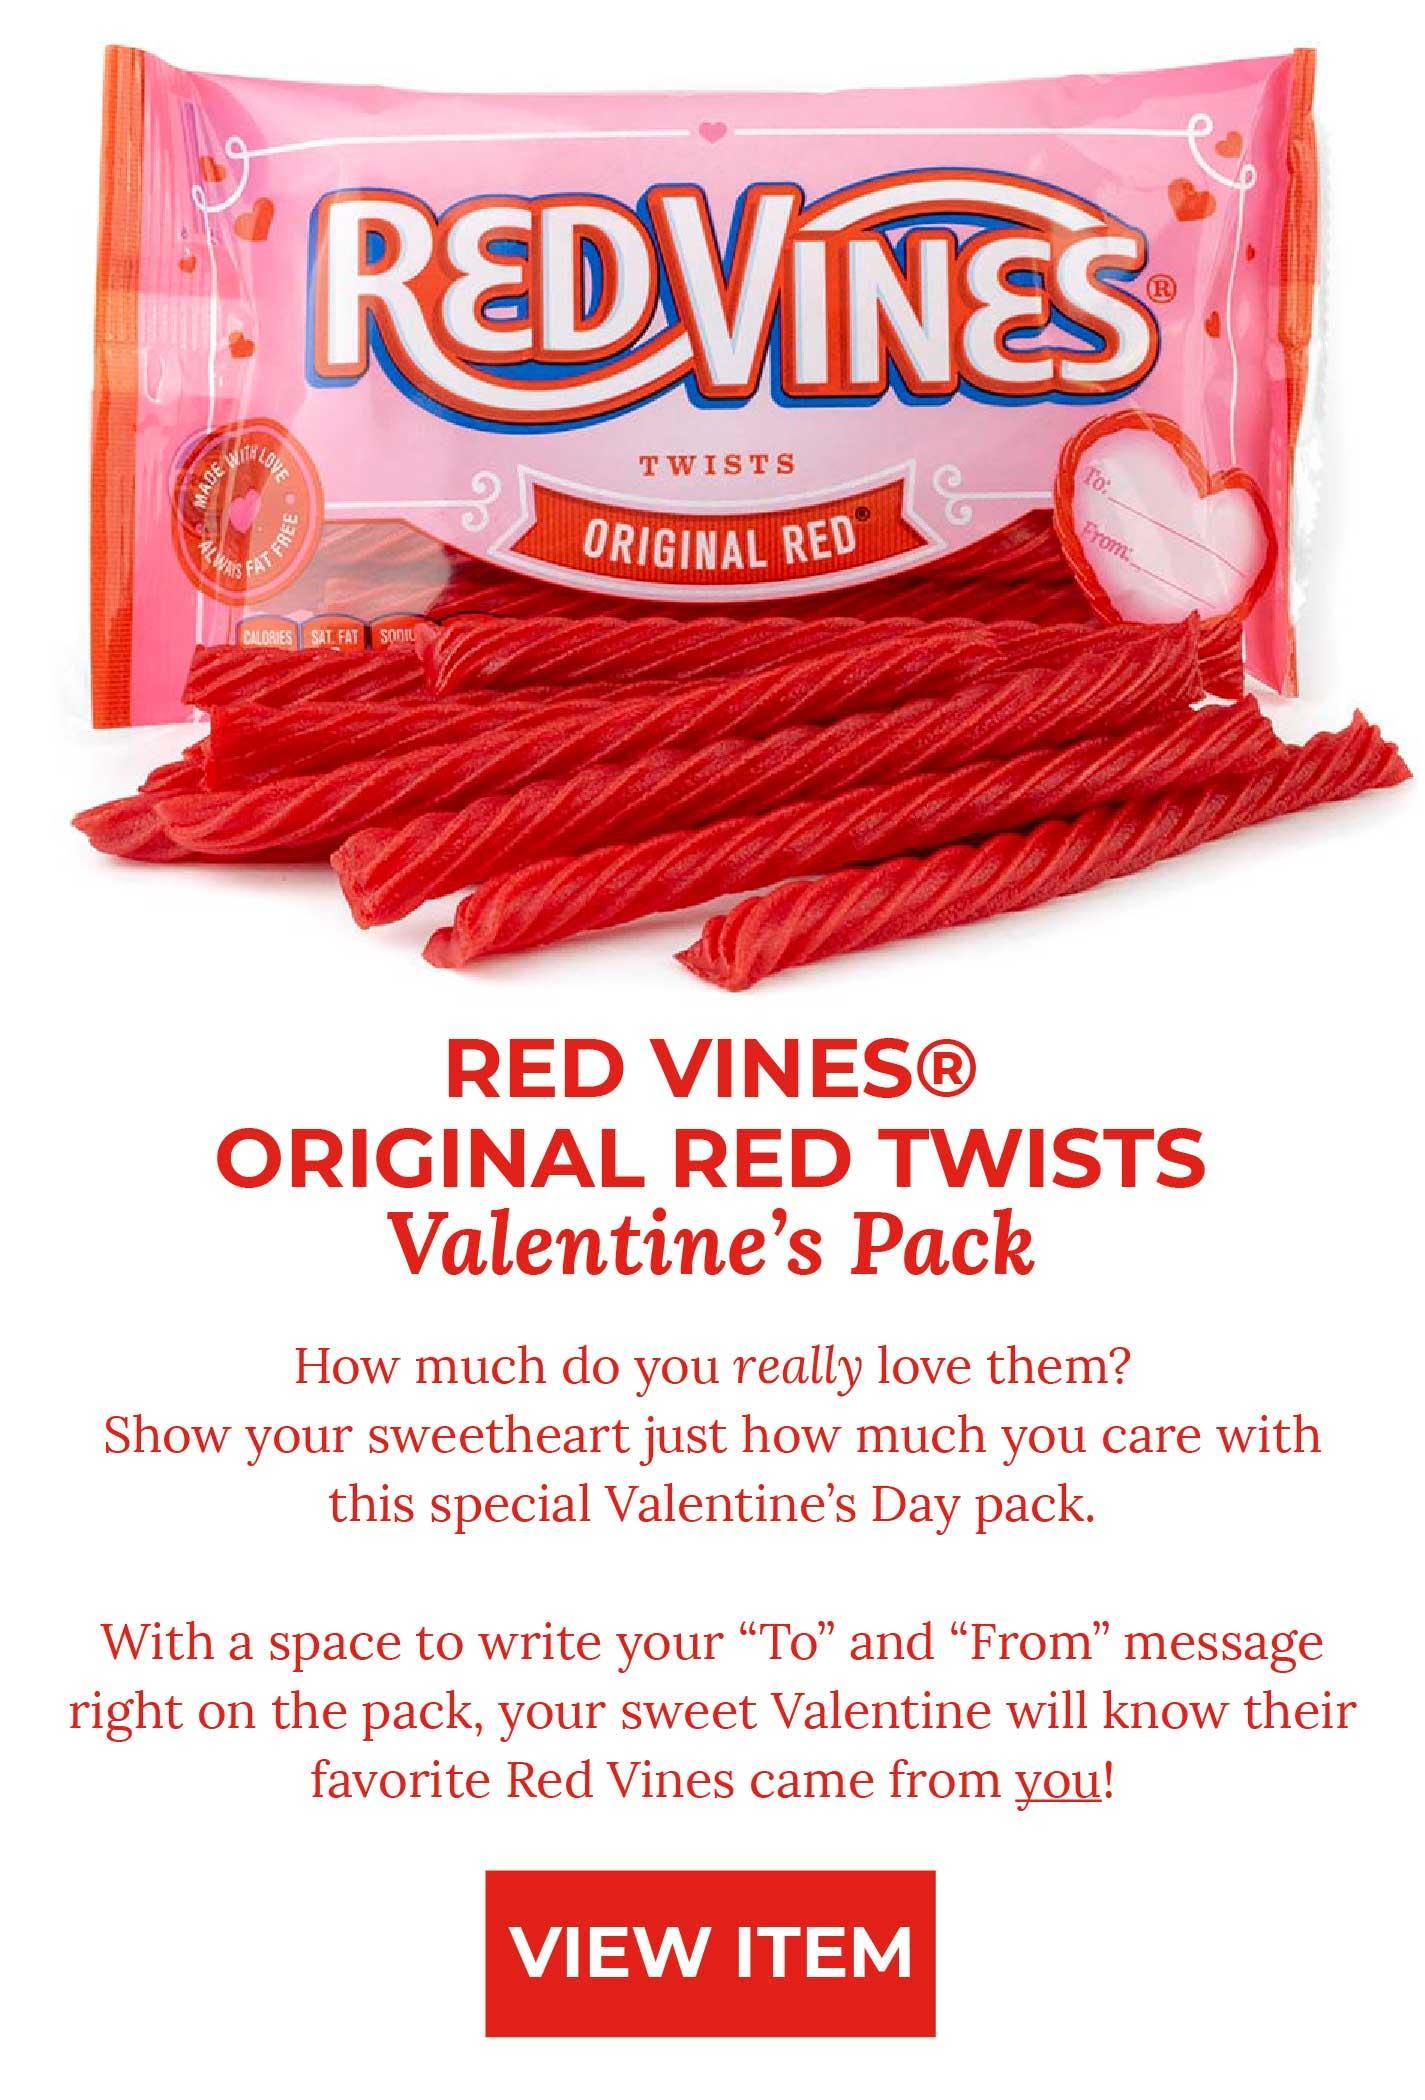 Red Vines Original Red Twists Valentine's Pack - VIEW ITEM